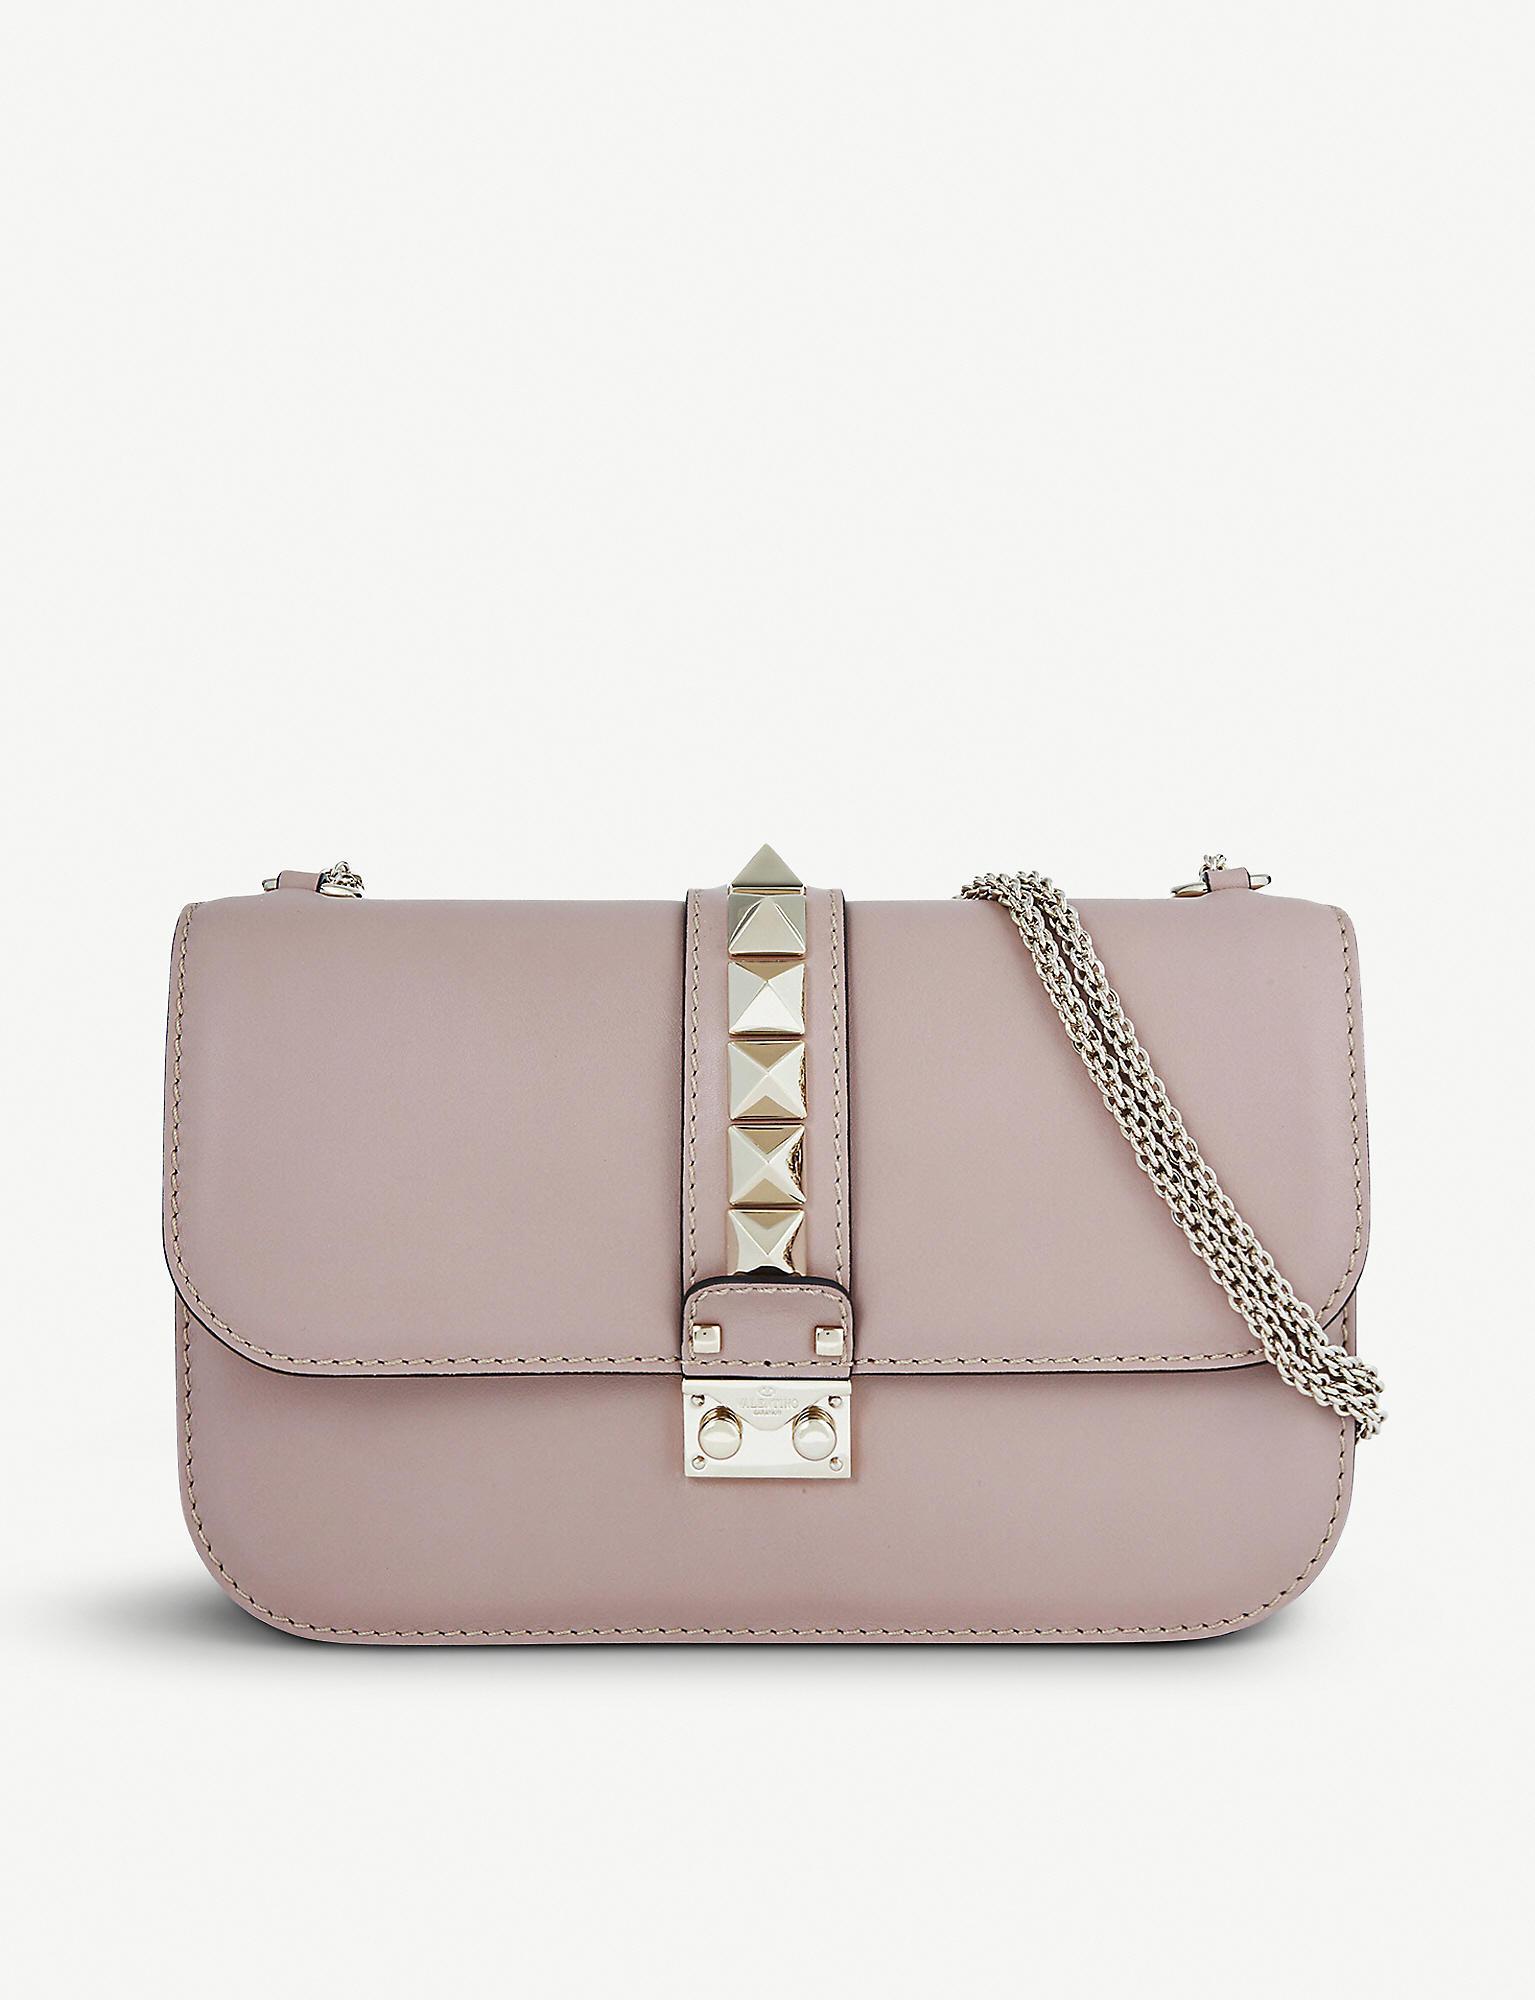 cdd24516d Valentino Studded Medium Leather Shoulder Bag in Purple - Lyst